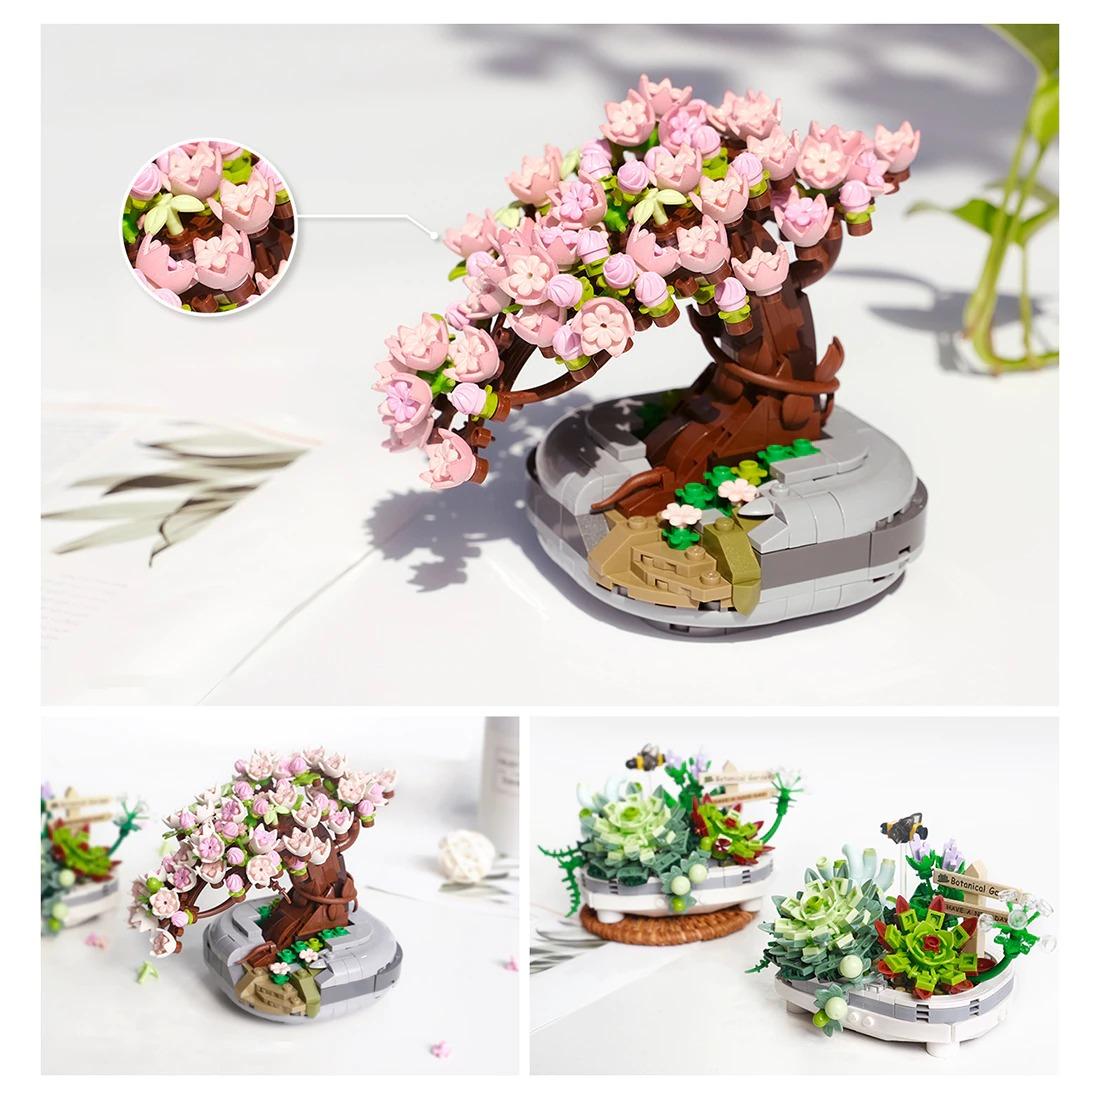 Eternal Flowers Garden Cherry Blossom CREATOR LOZ 1661 with 426 pieces